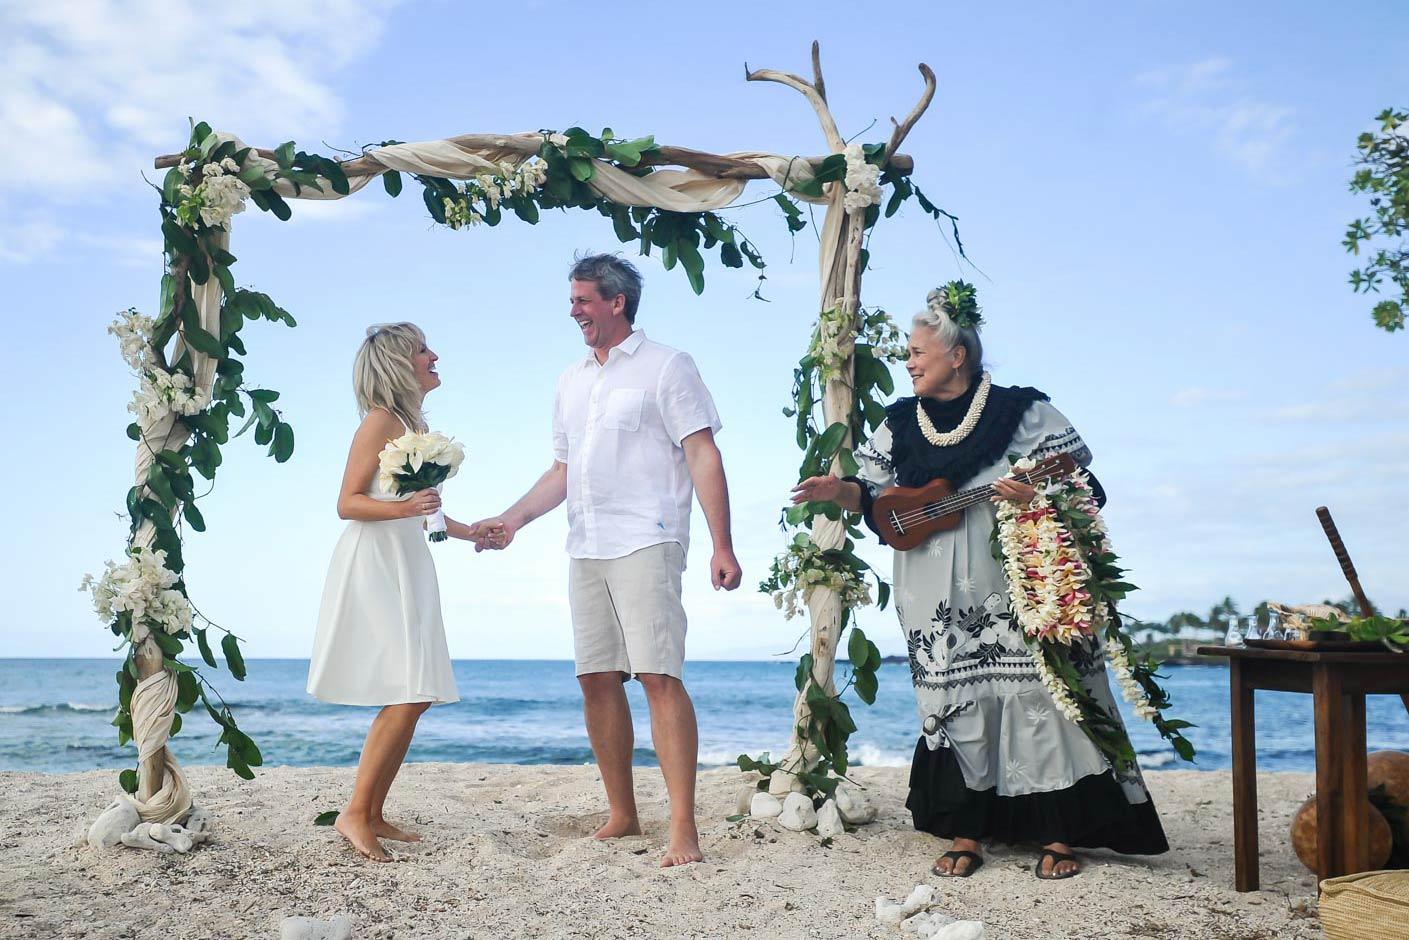 Beach-Weddings-in-Hawaii.jpg